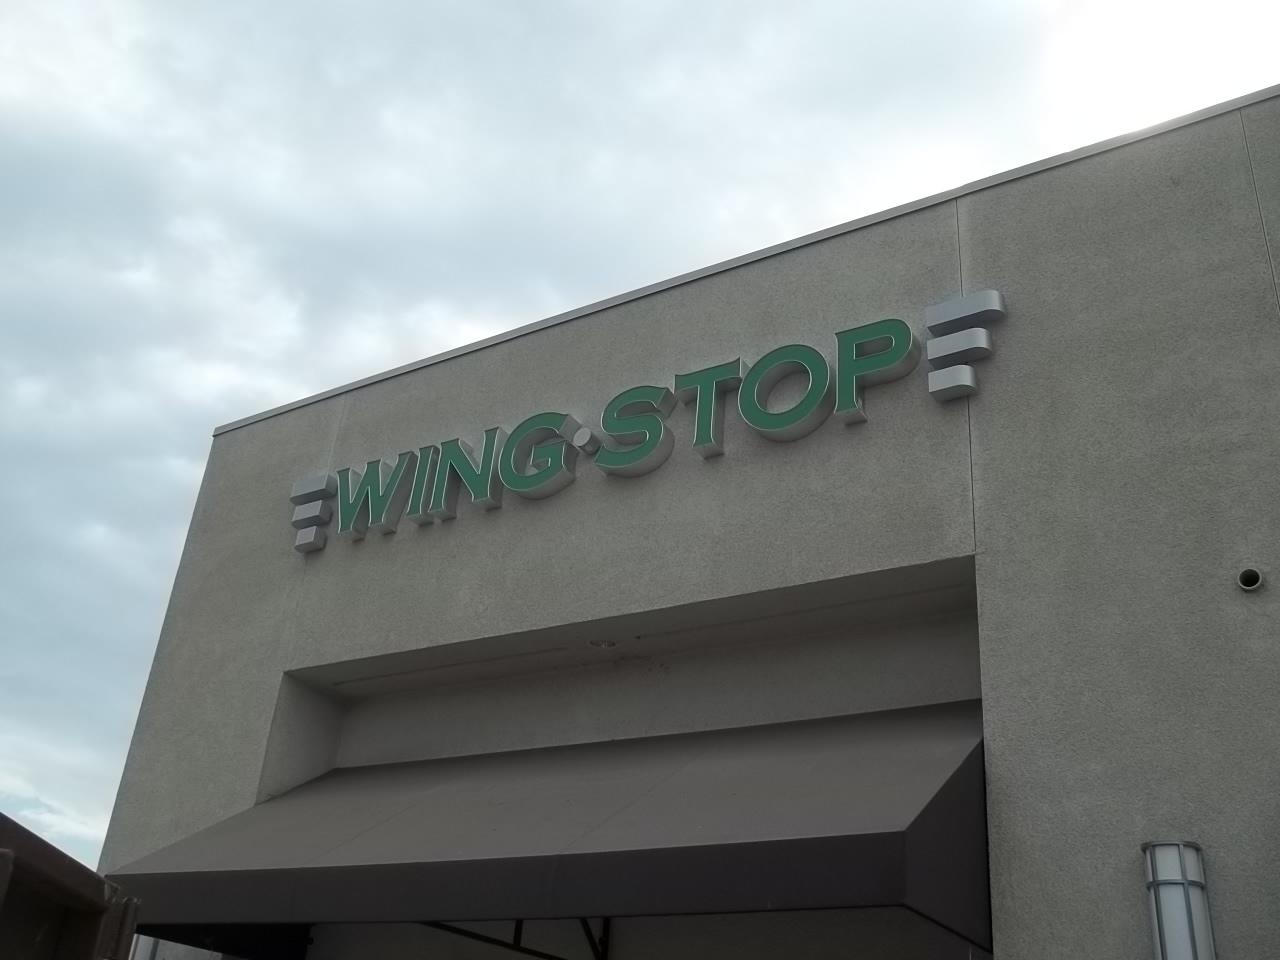 Wing Stop Manteca